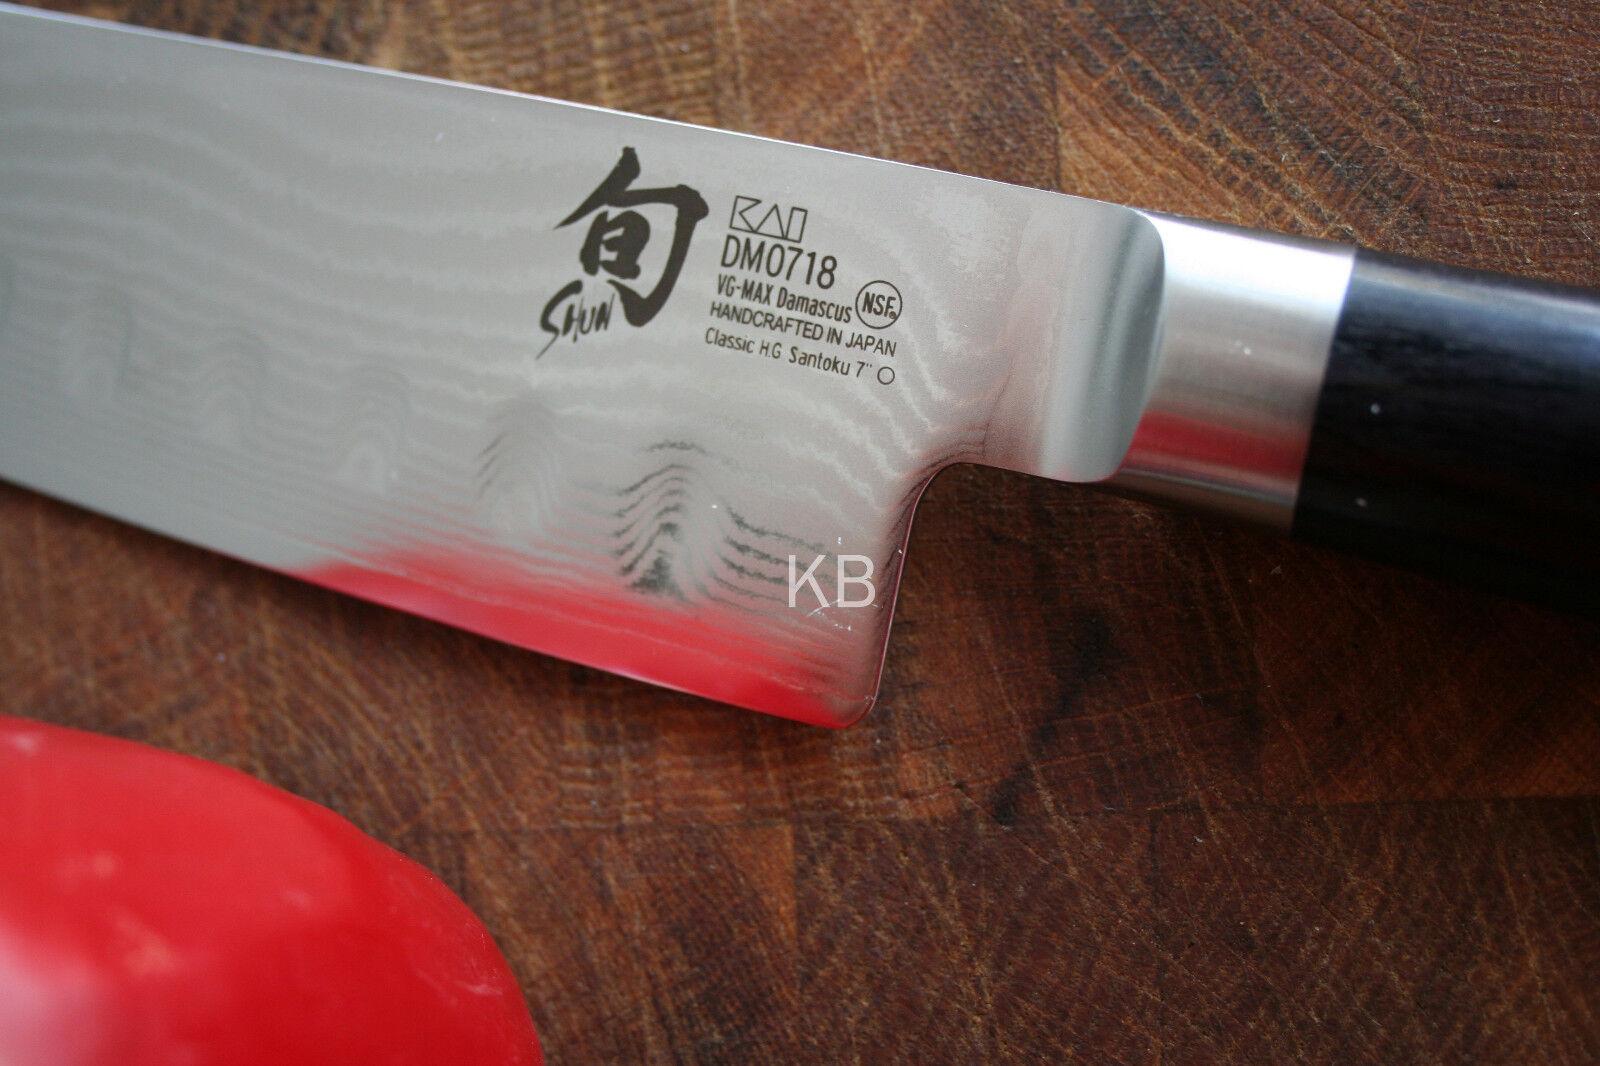 Kai dm-0718 Chun Classic santokumesser 18 CM